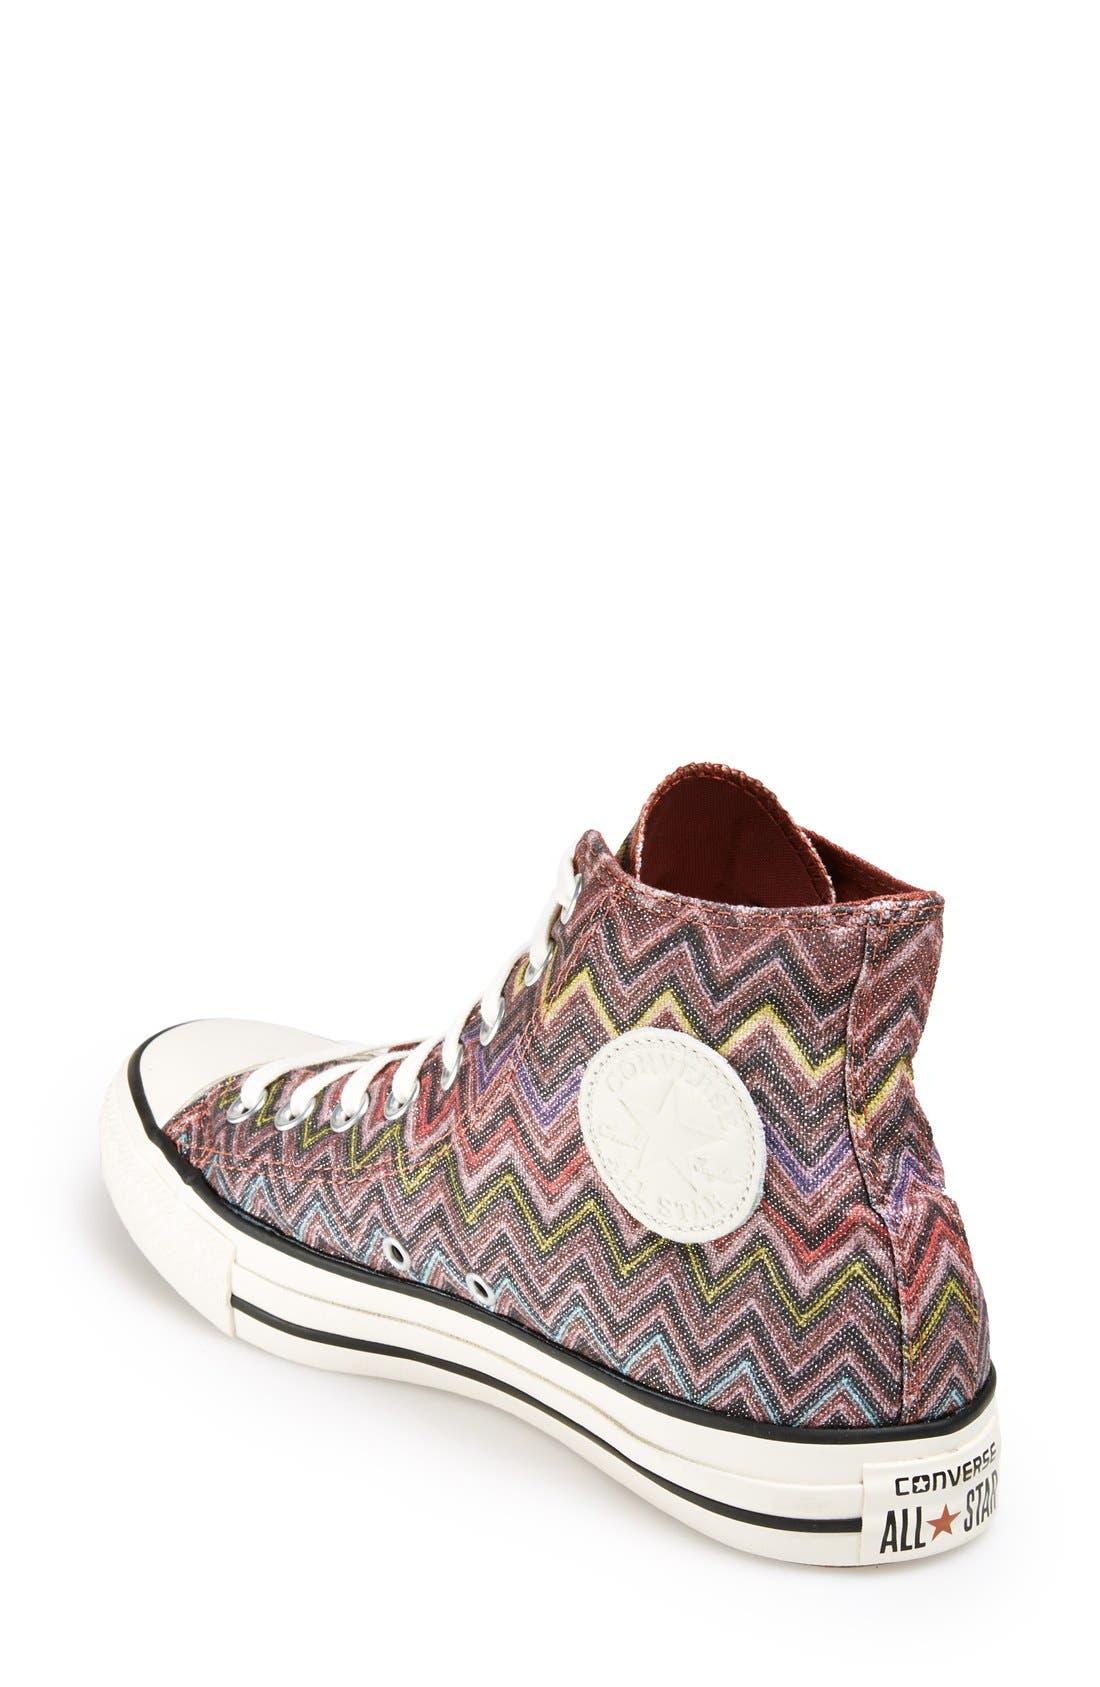 Alternate Image 2  - Converse x Missoni Chuck Taylor® All Star® High Top Sneaker (Women)